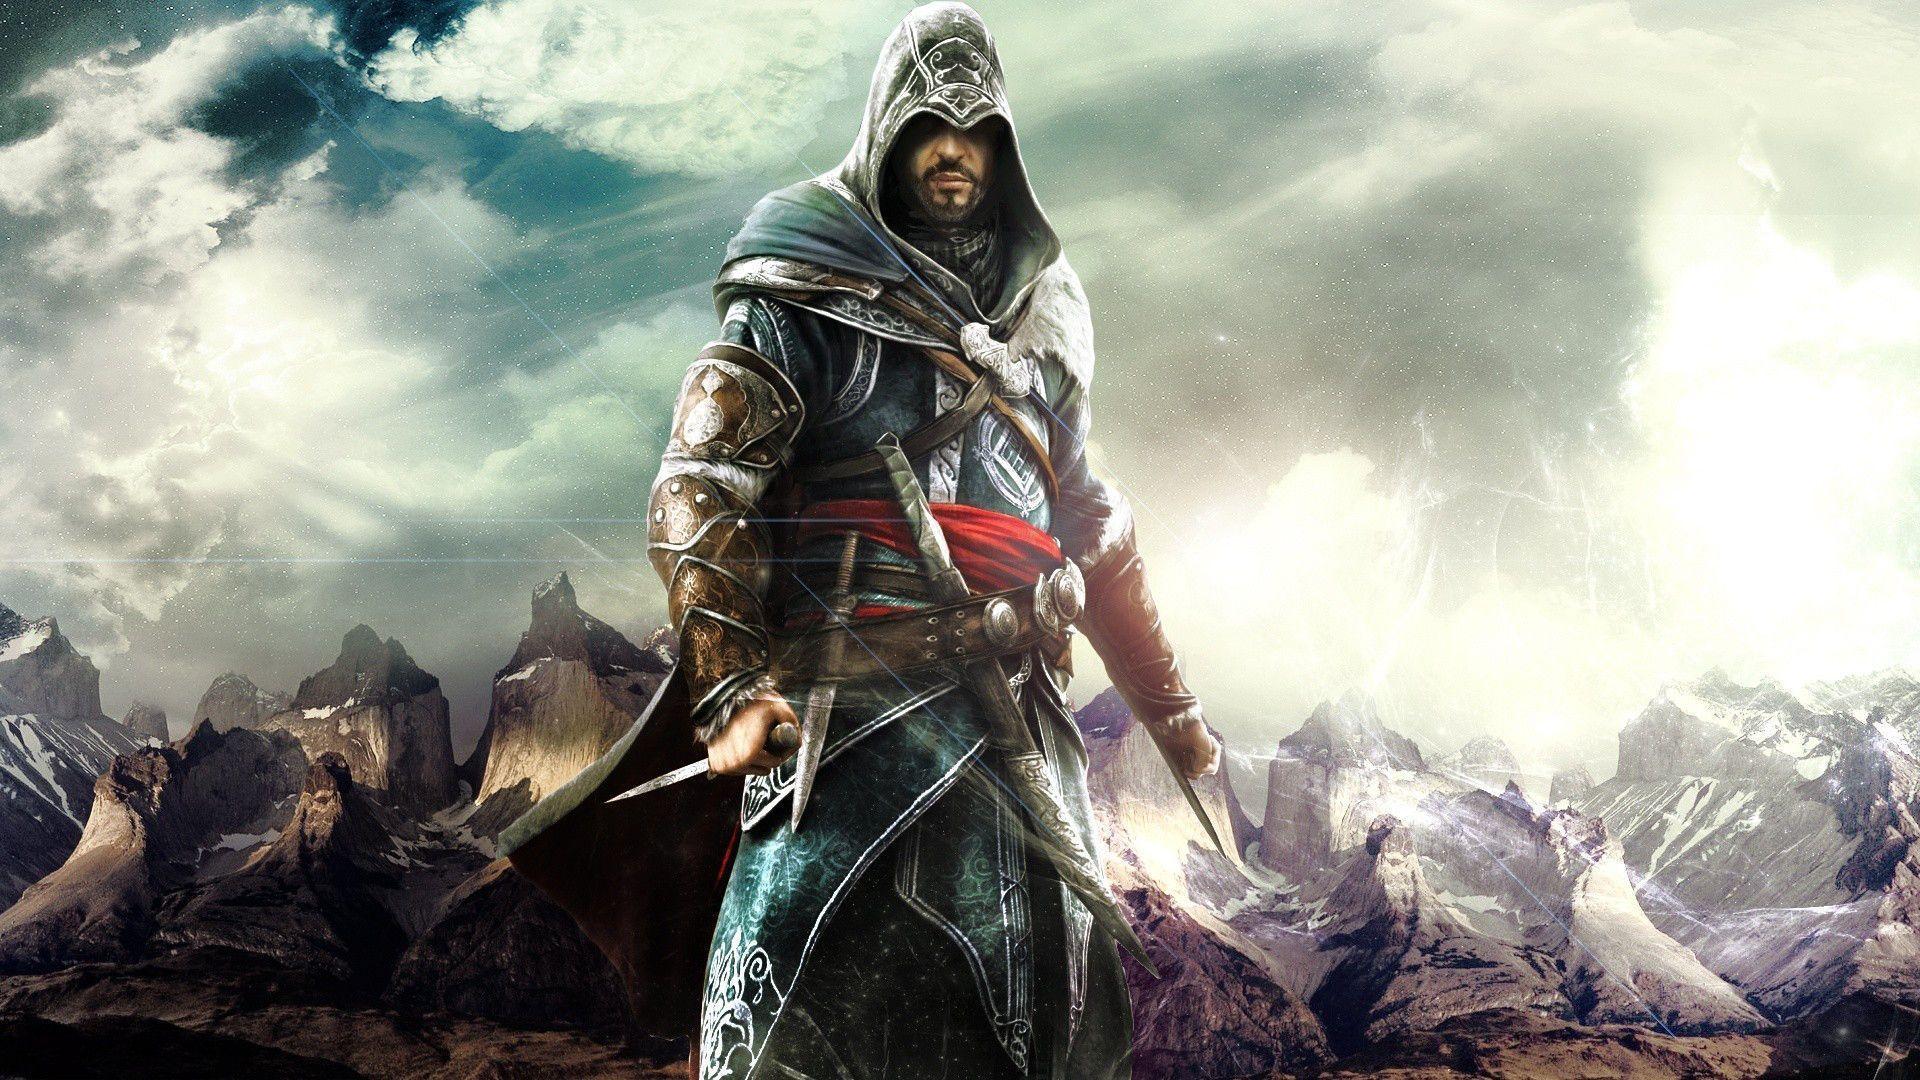 Wallpaper download games - Hd Wallpaper Games Wallpapers For Mac Ezio The Best Assassin